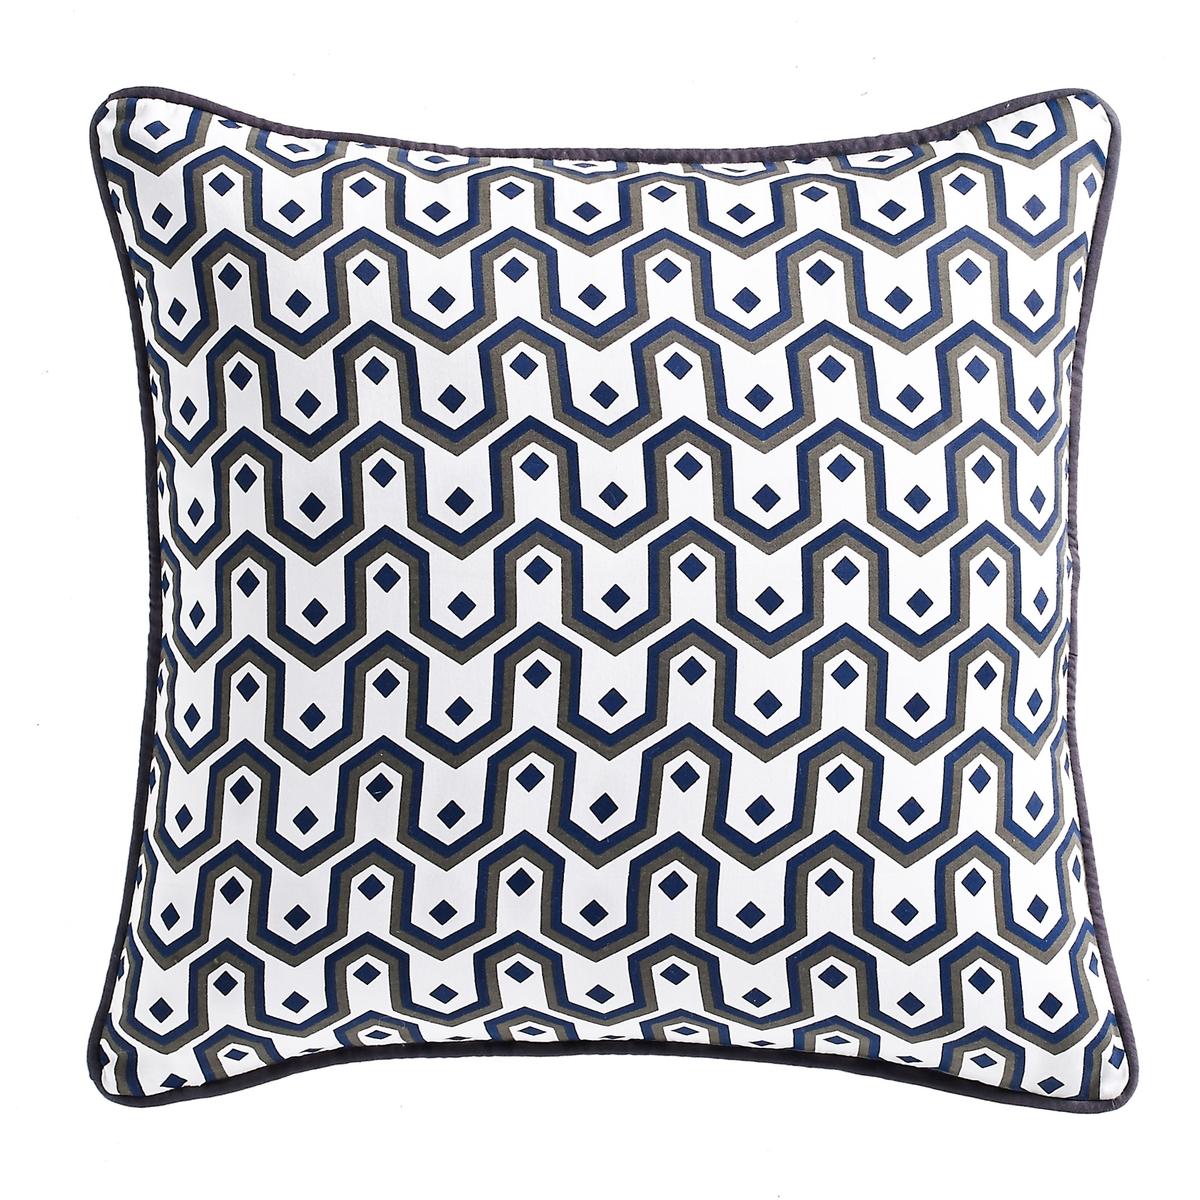 Чехол для подушки из хлопкового сатина с рисунком, Selisa